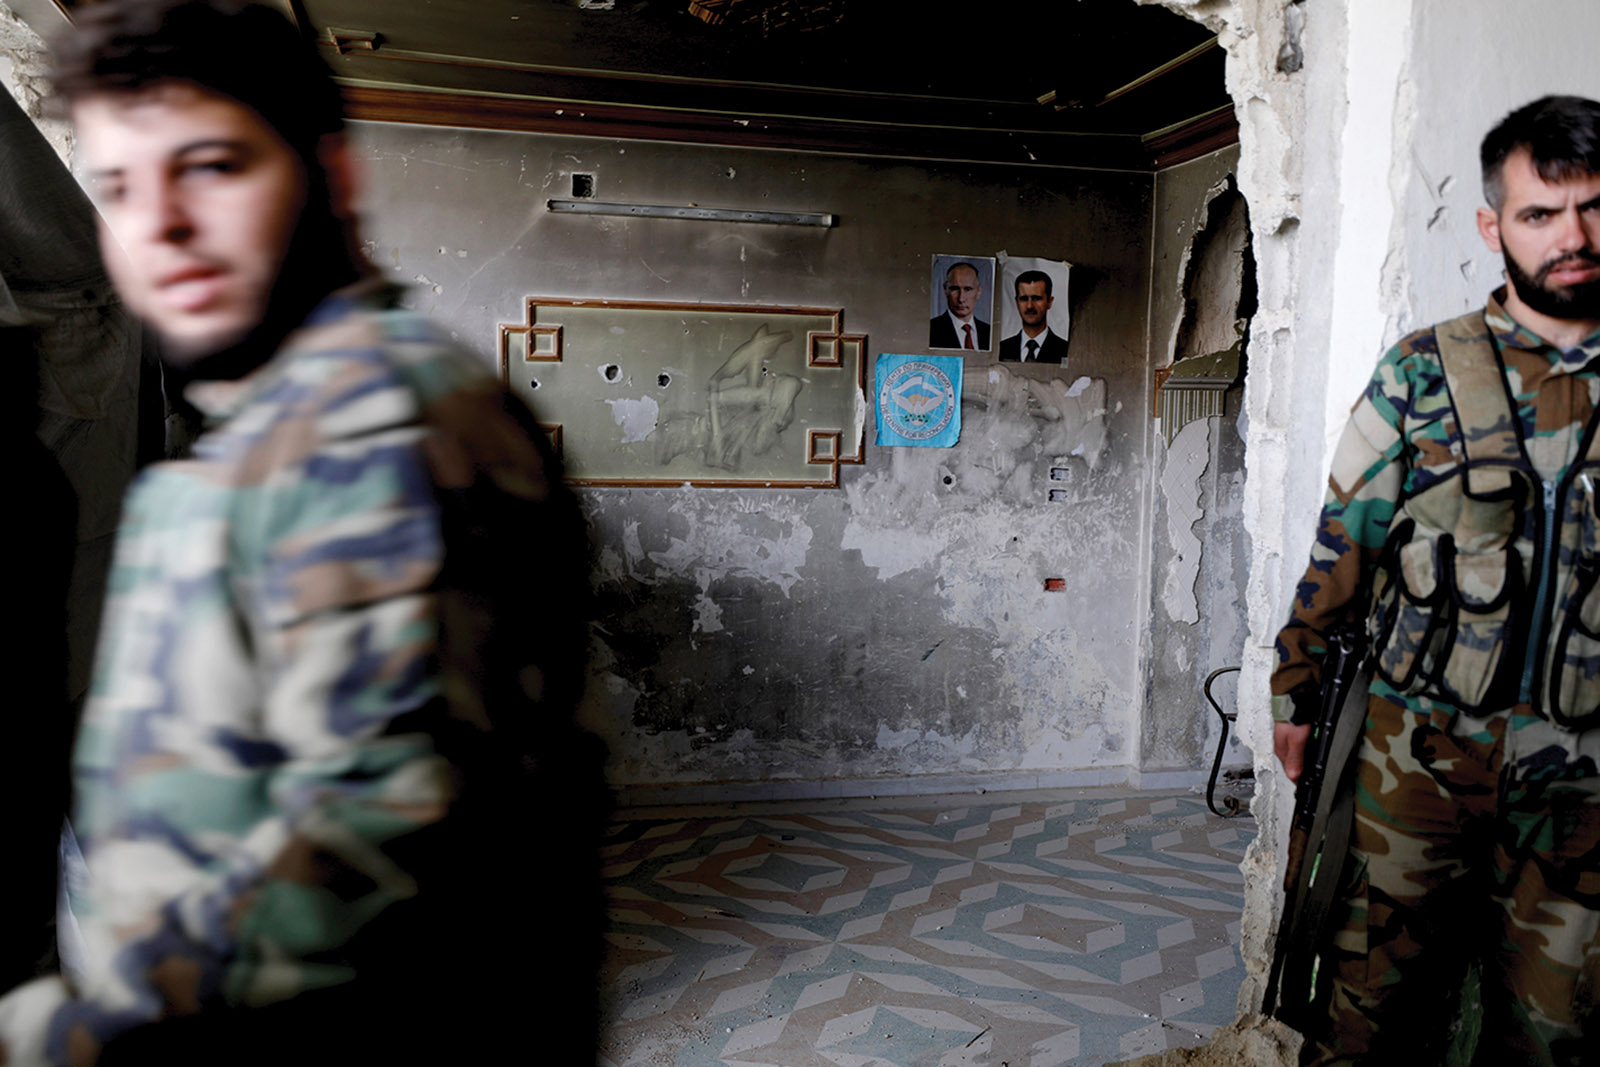 Syrian soldiers loyal to Bashar al-Assad, eastern Ghouta, February 2018